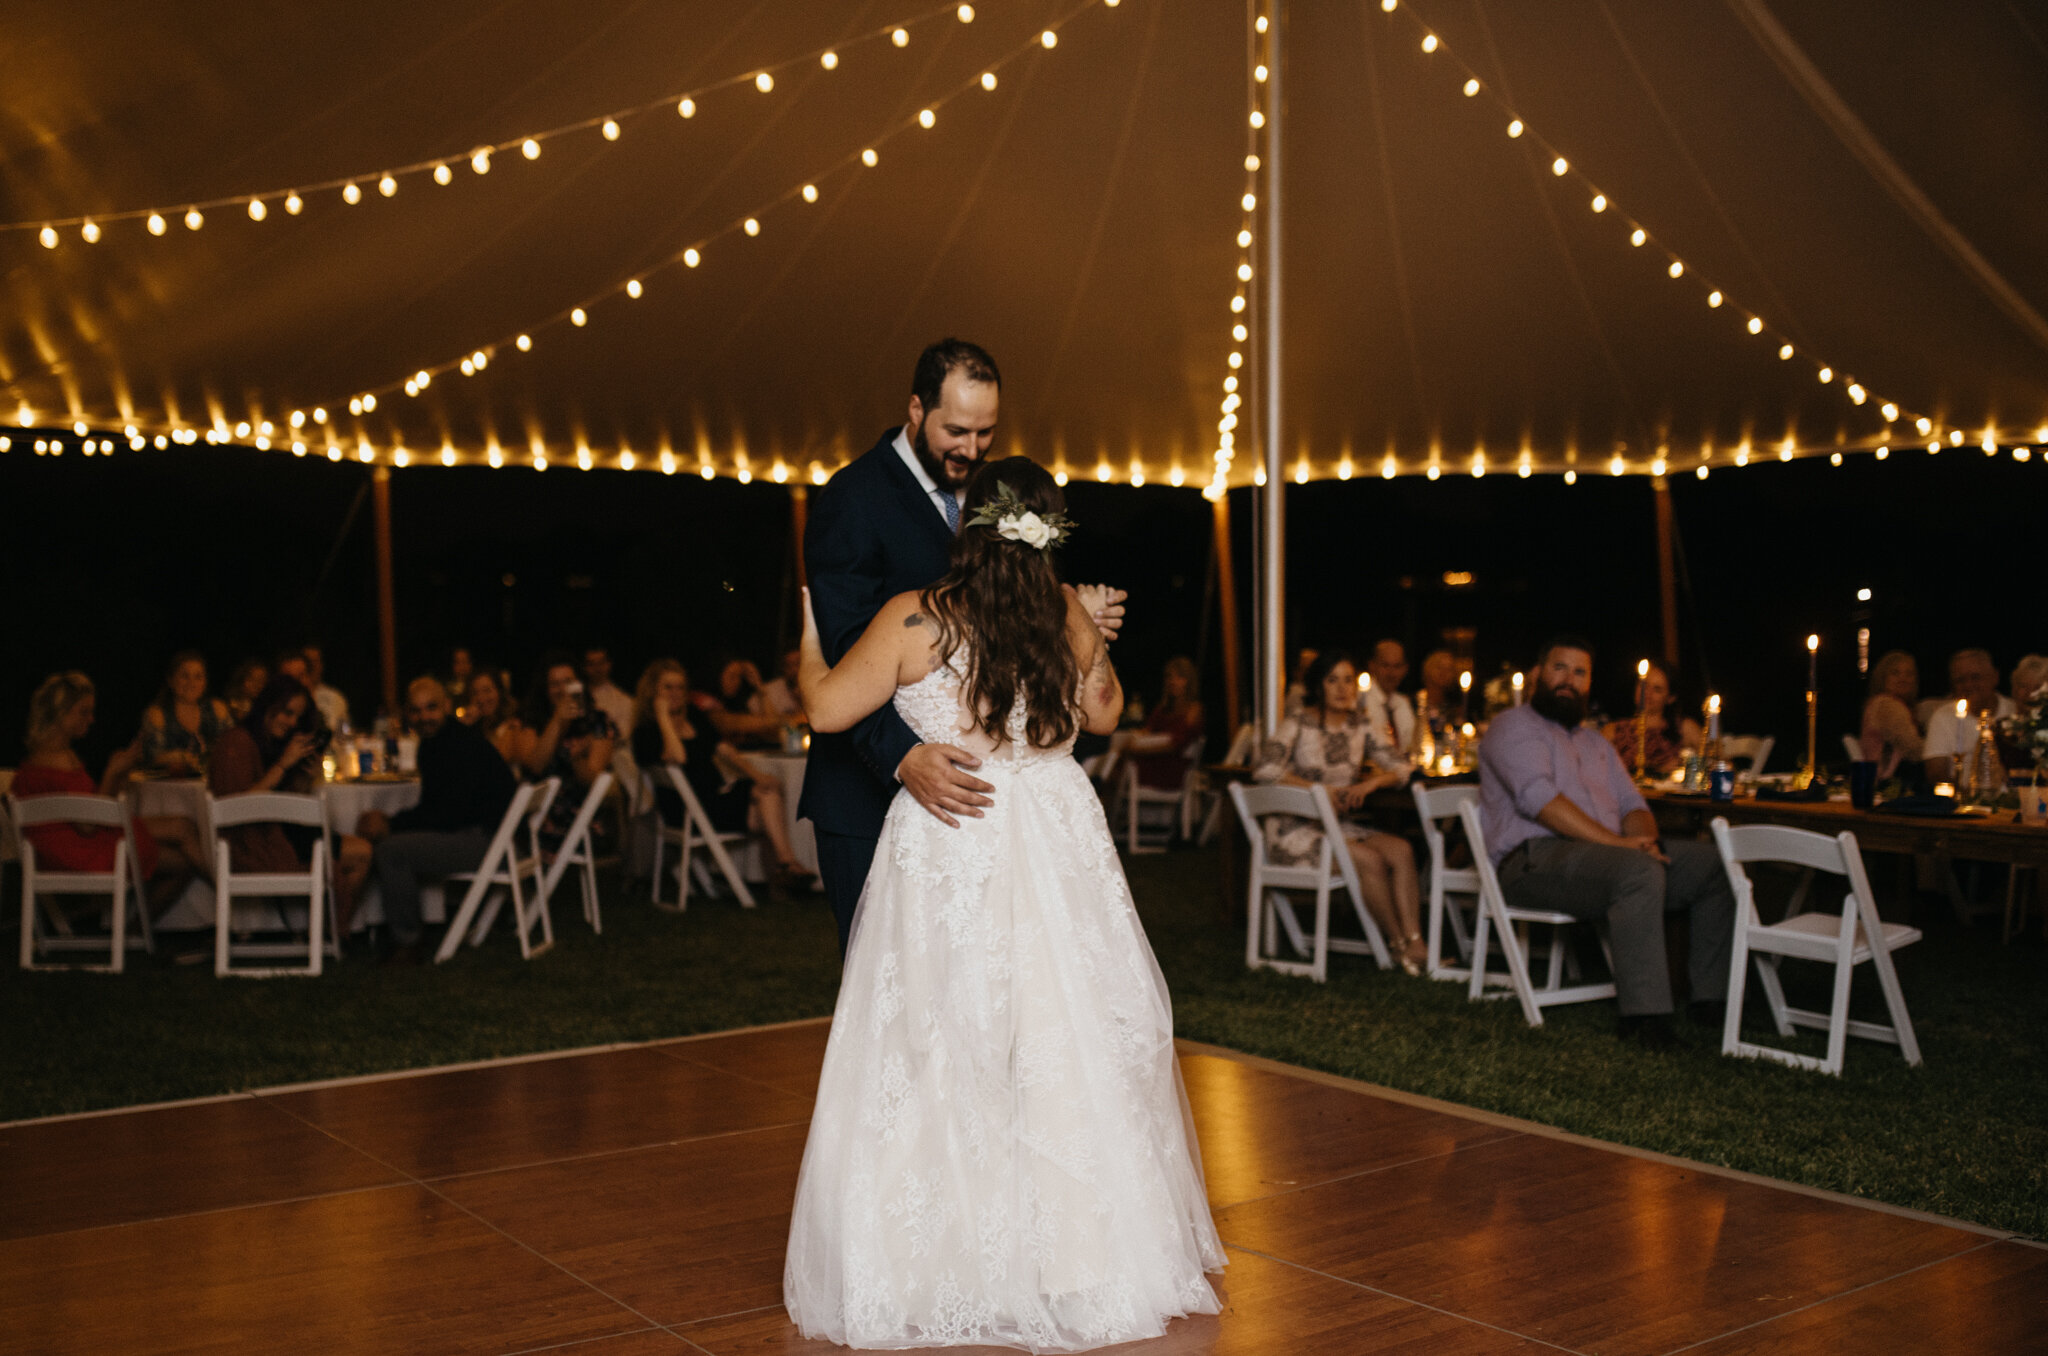 angela_jason_norfolk_wedding-157.jpg